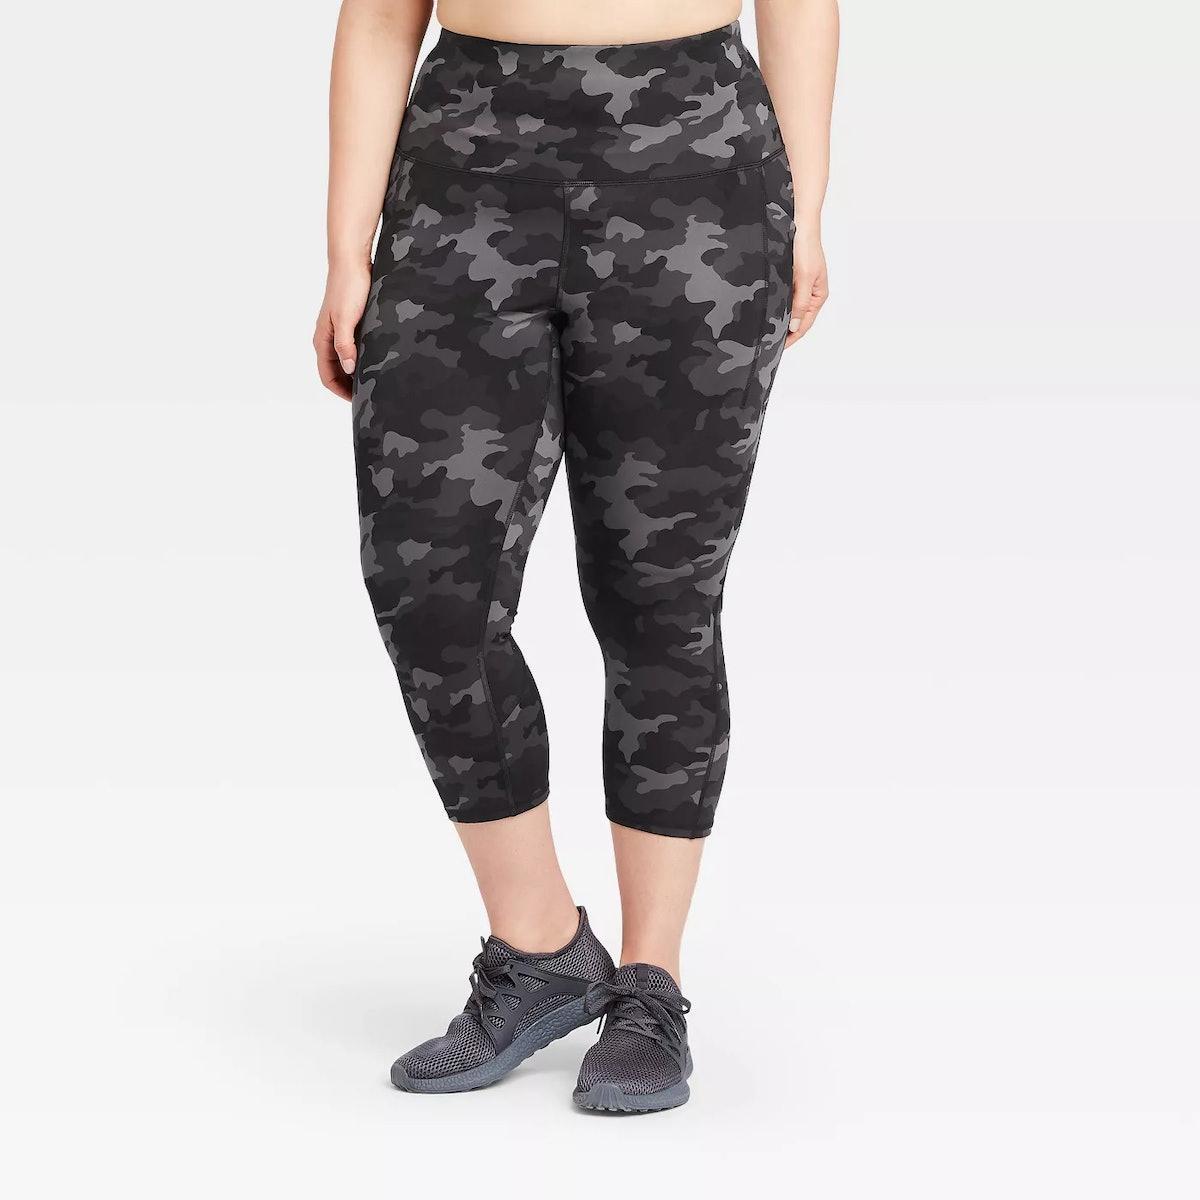 All In Motion Women's Plus Size Camo Print Sculpted High-Rise Capri Leggings